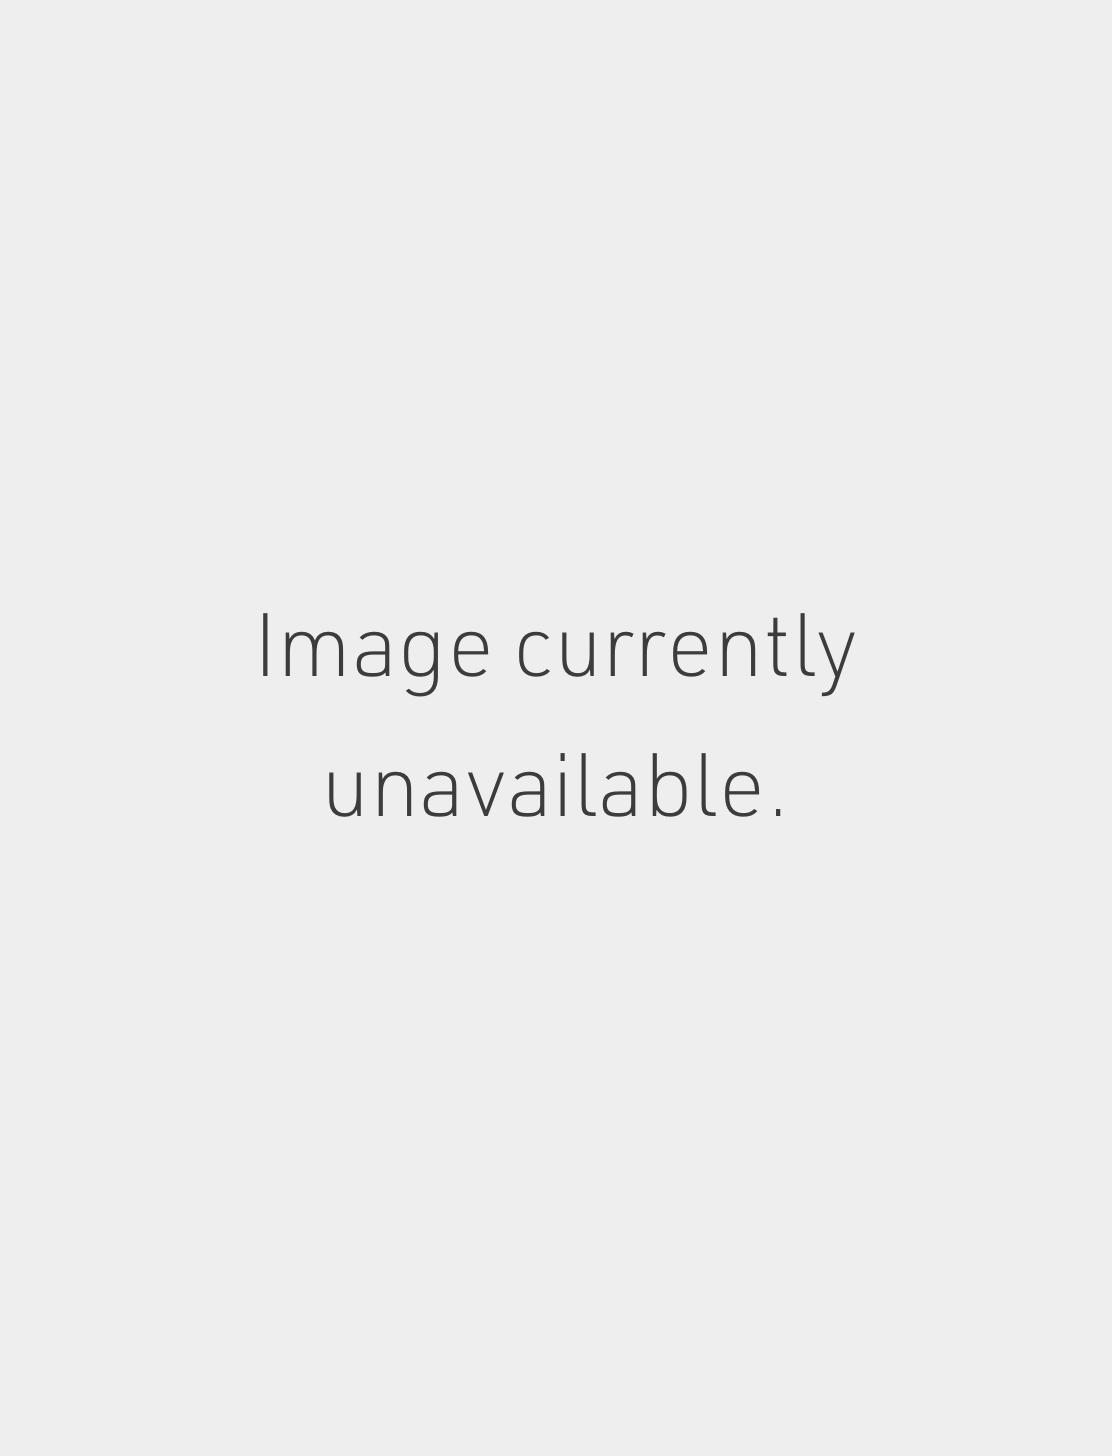 Ajna Dangle and Gold Ball Barbell Image #1